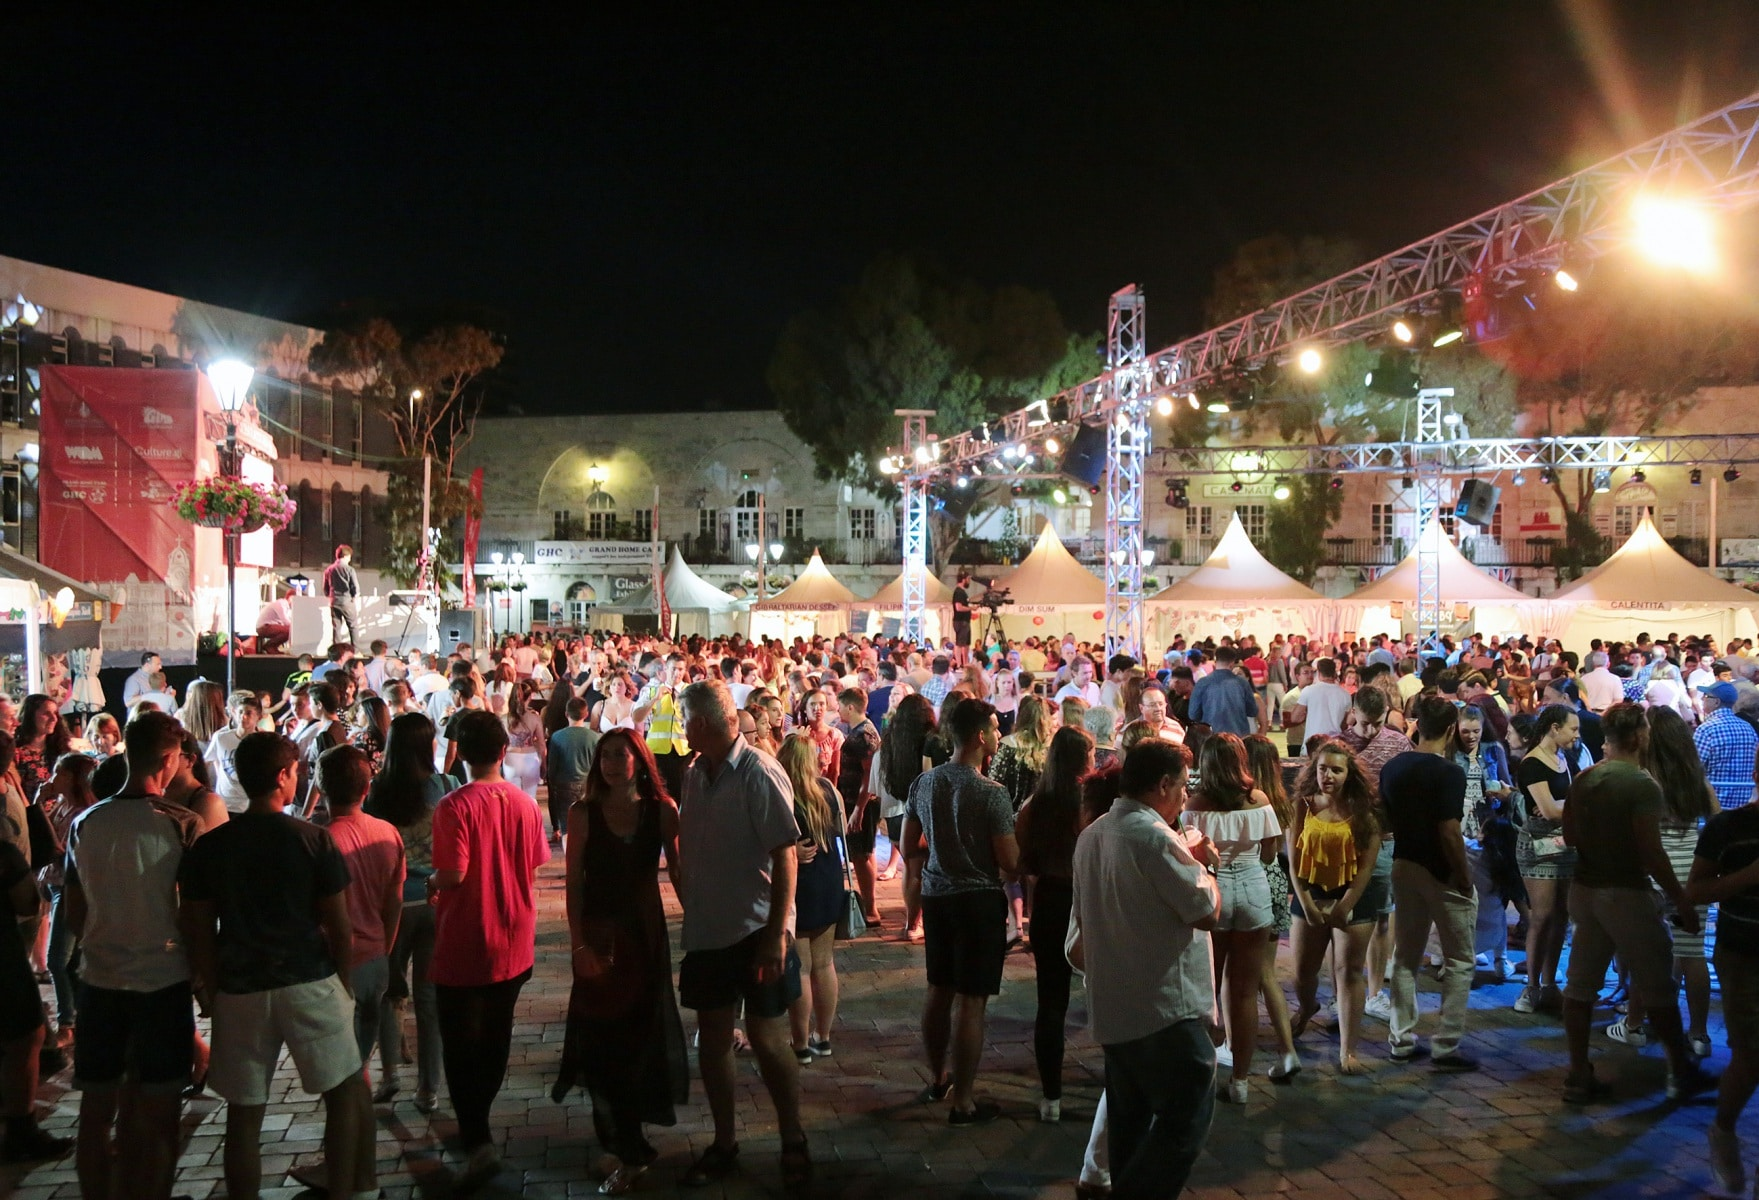 18-jun-2016-noche-de-la-calentita-en-gibraltar_27222140483_o